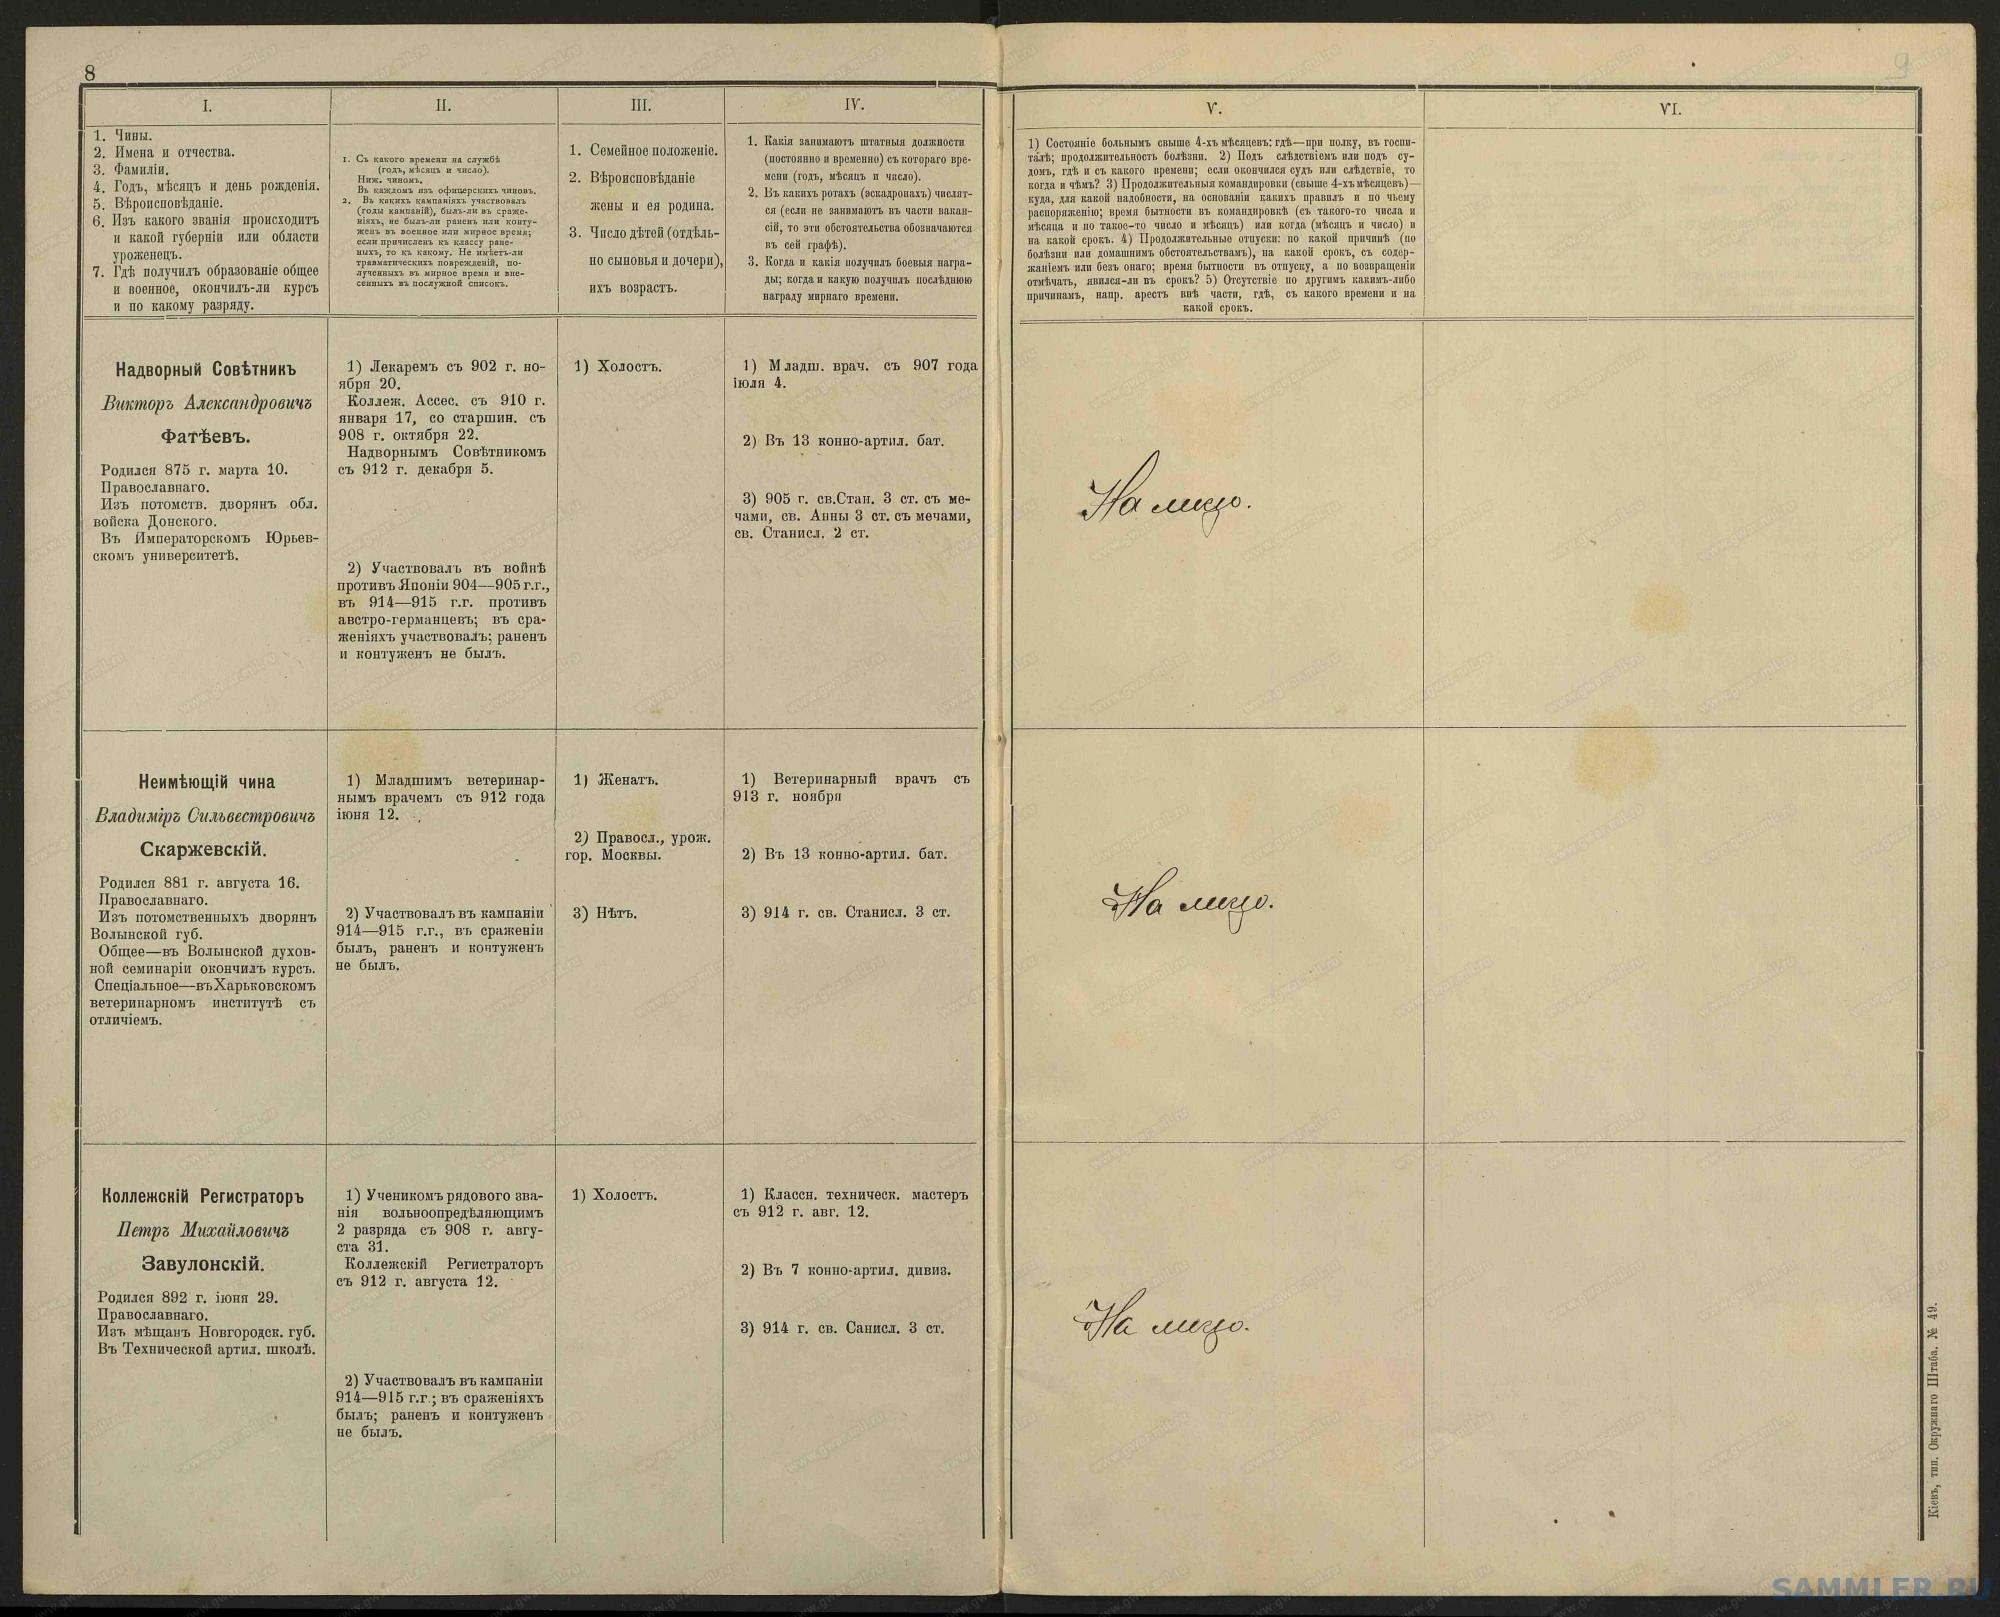 Список офицеров 7-го конно-артиллерийского дивизиона на 01.01.1915__12_.jpg